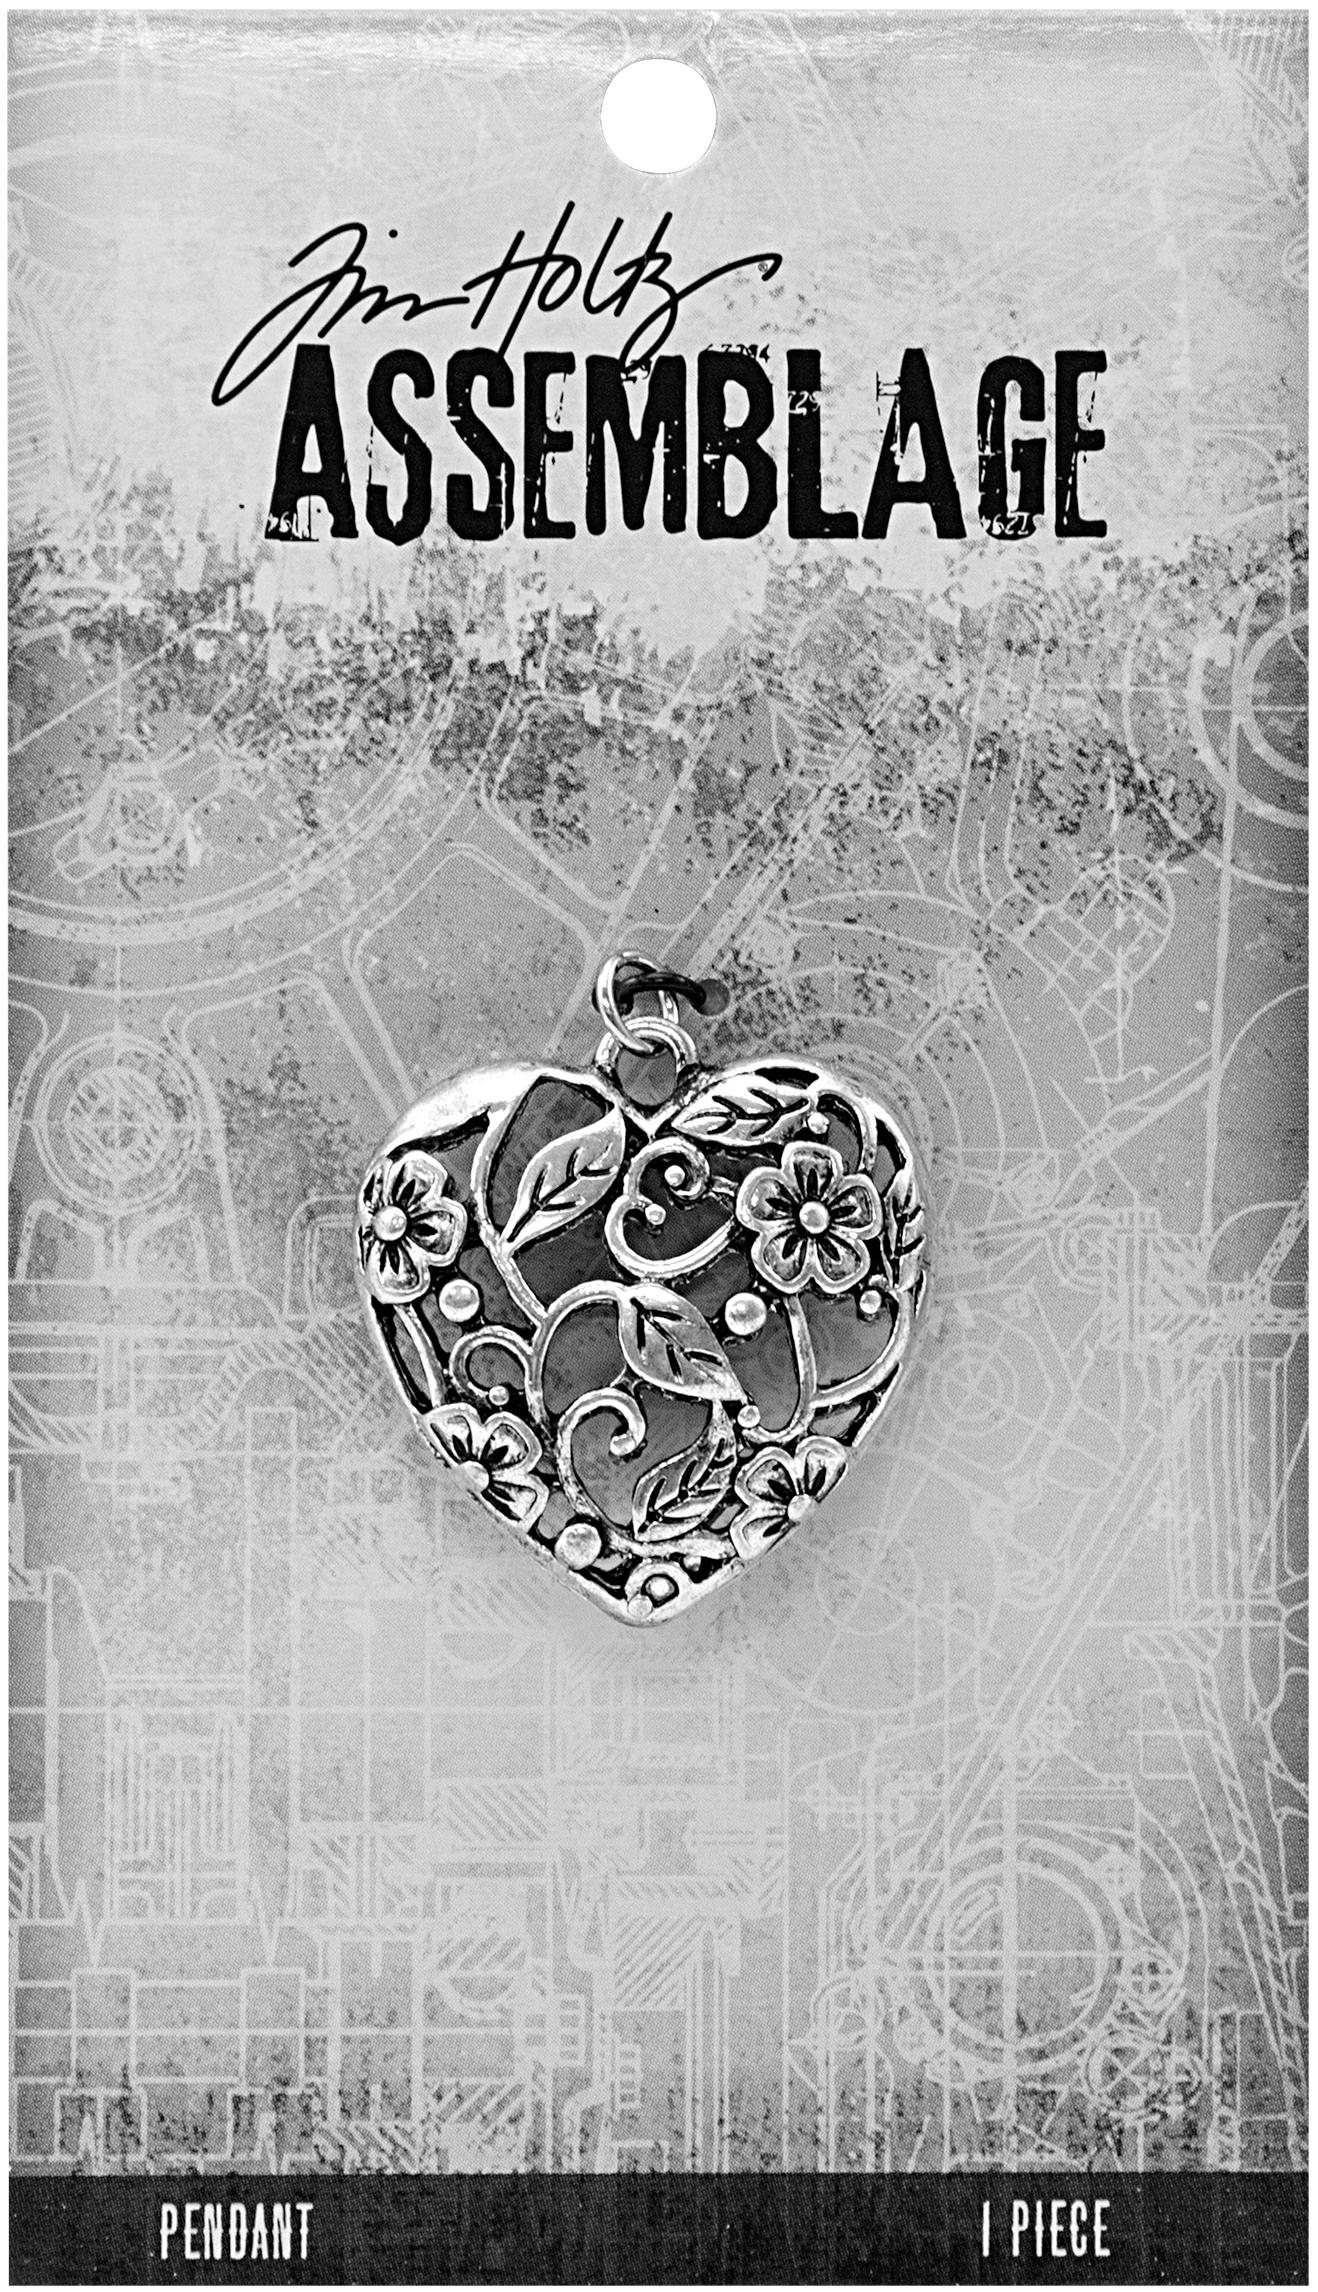 Tim Holtz Assemblage Pendant  -Ornate Heart